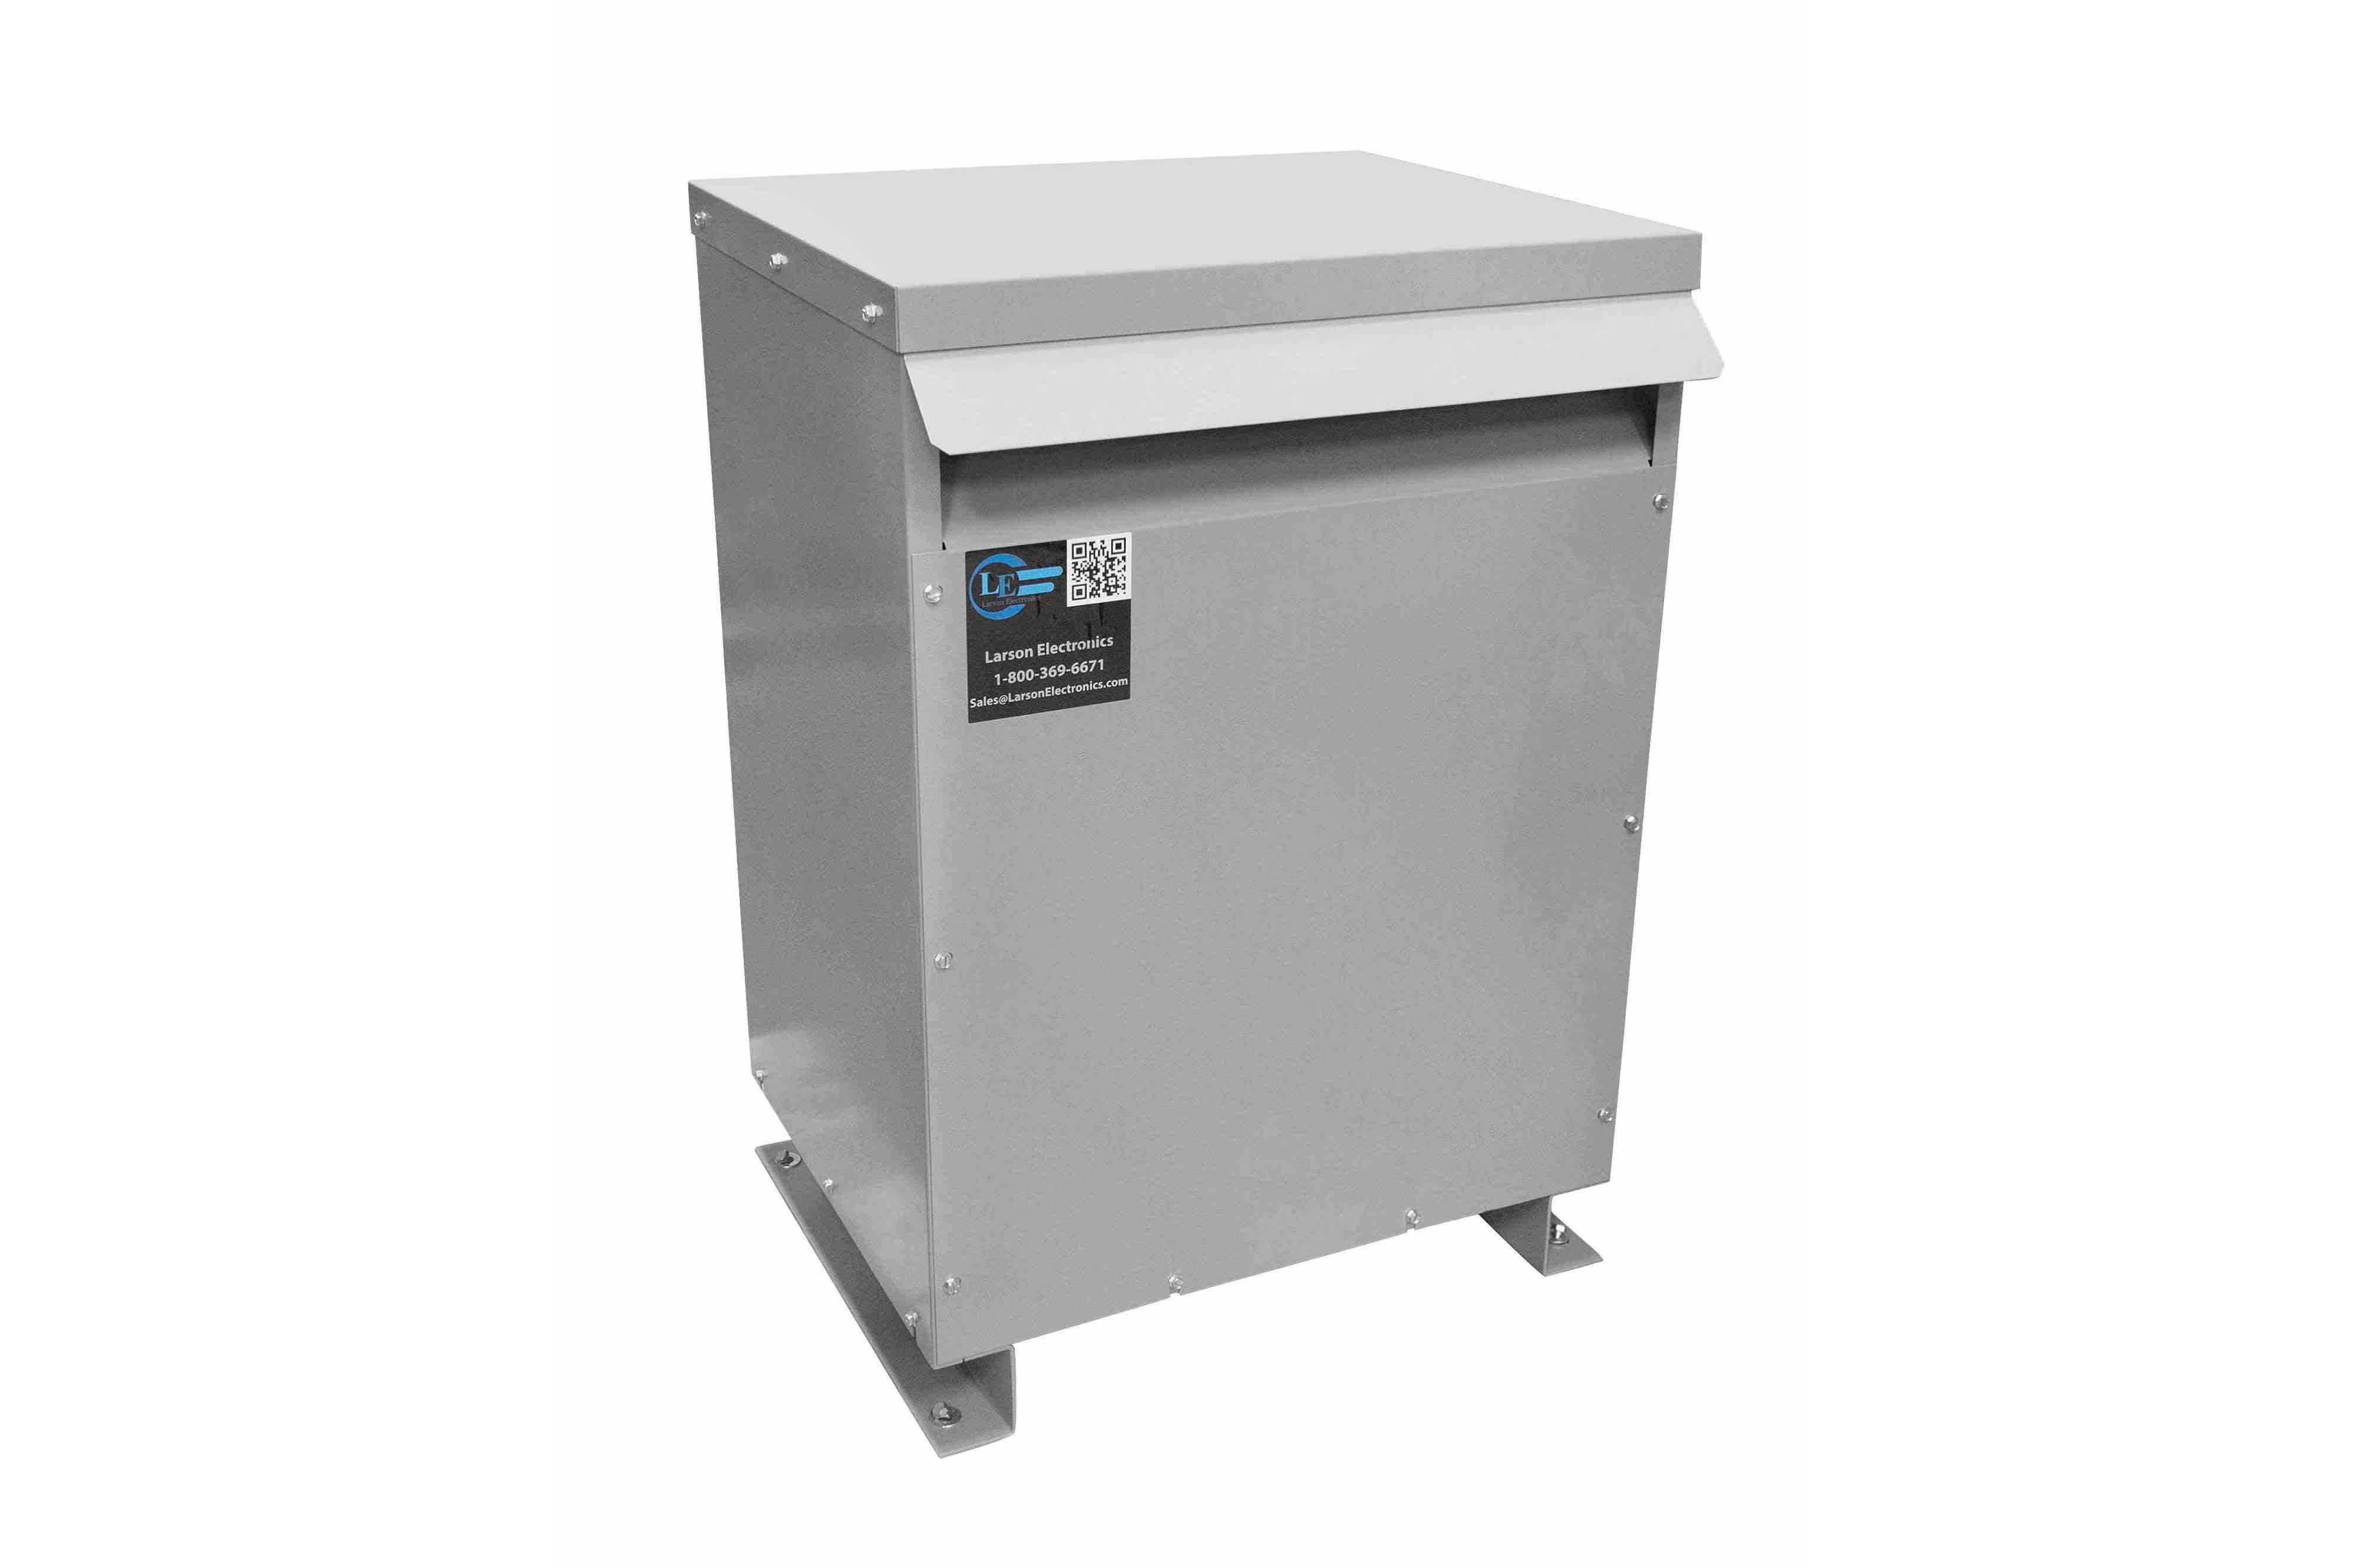 237.5 kVA 3PH Isolation Transformer, 600V Wye Primary, 240V/120 Delta Secondary, N3R, Ventilated, 60 Hz